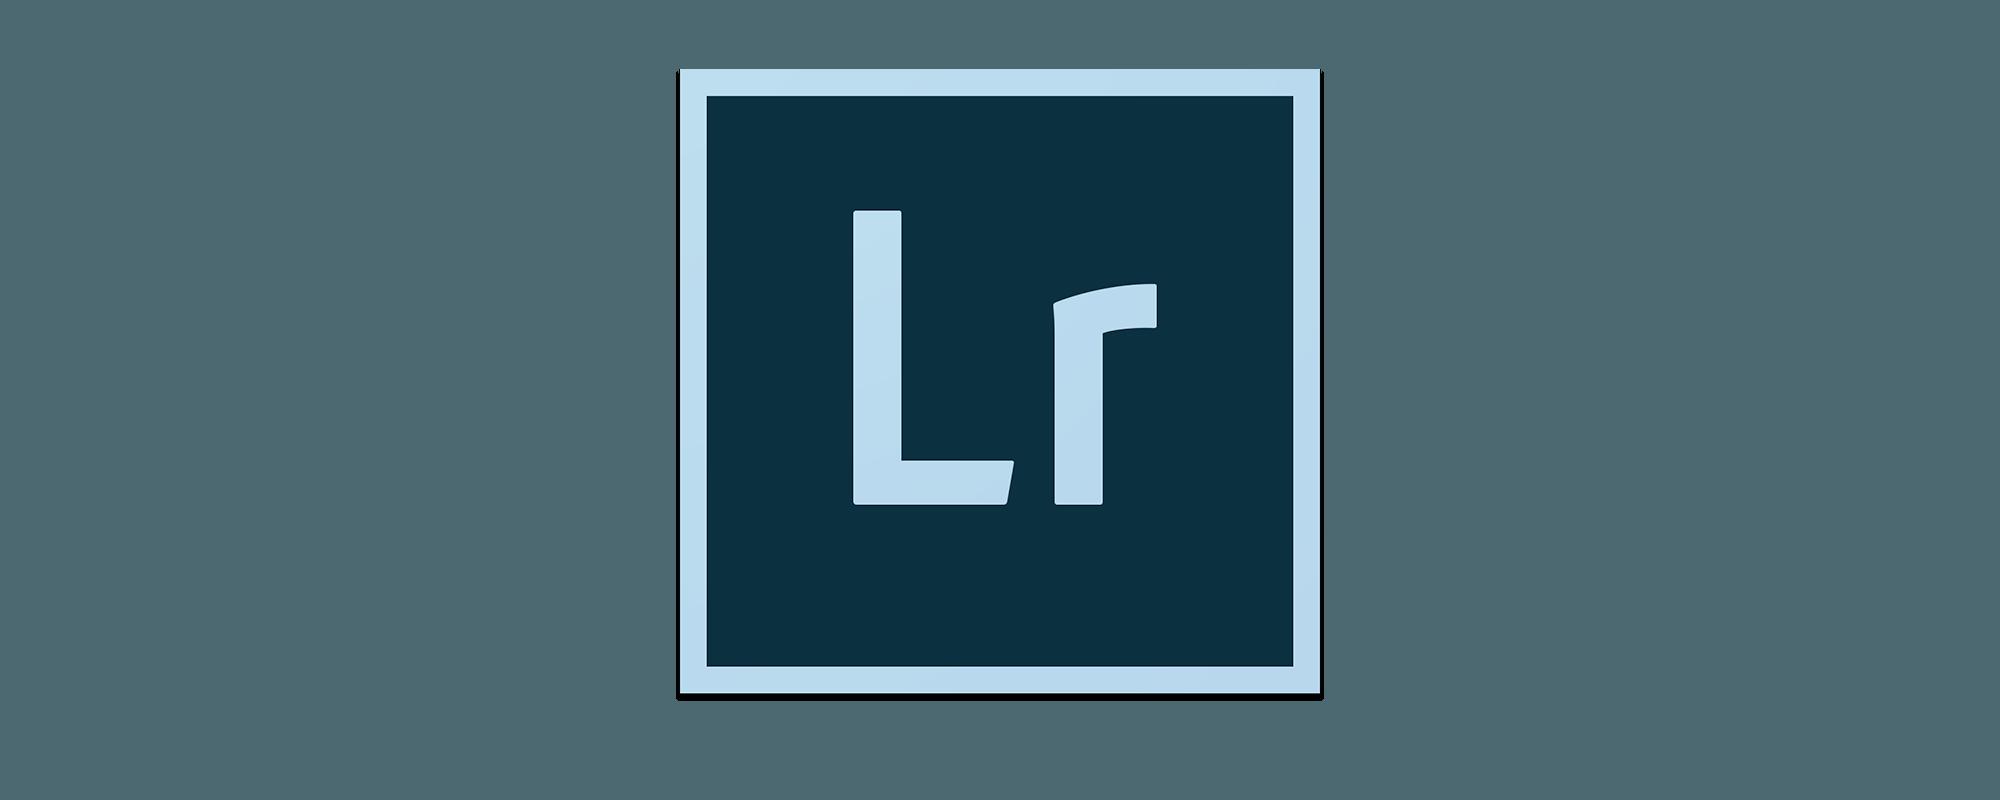 Adobe Lightroom Icon #259.